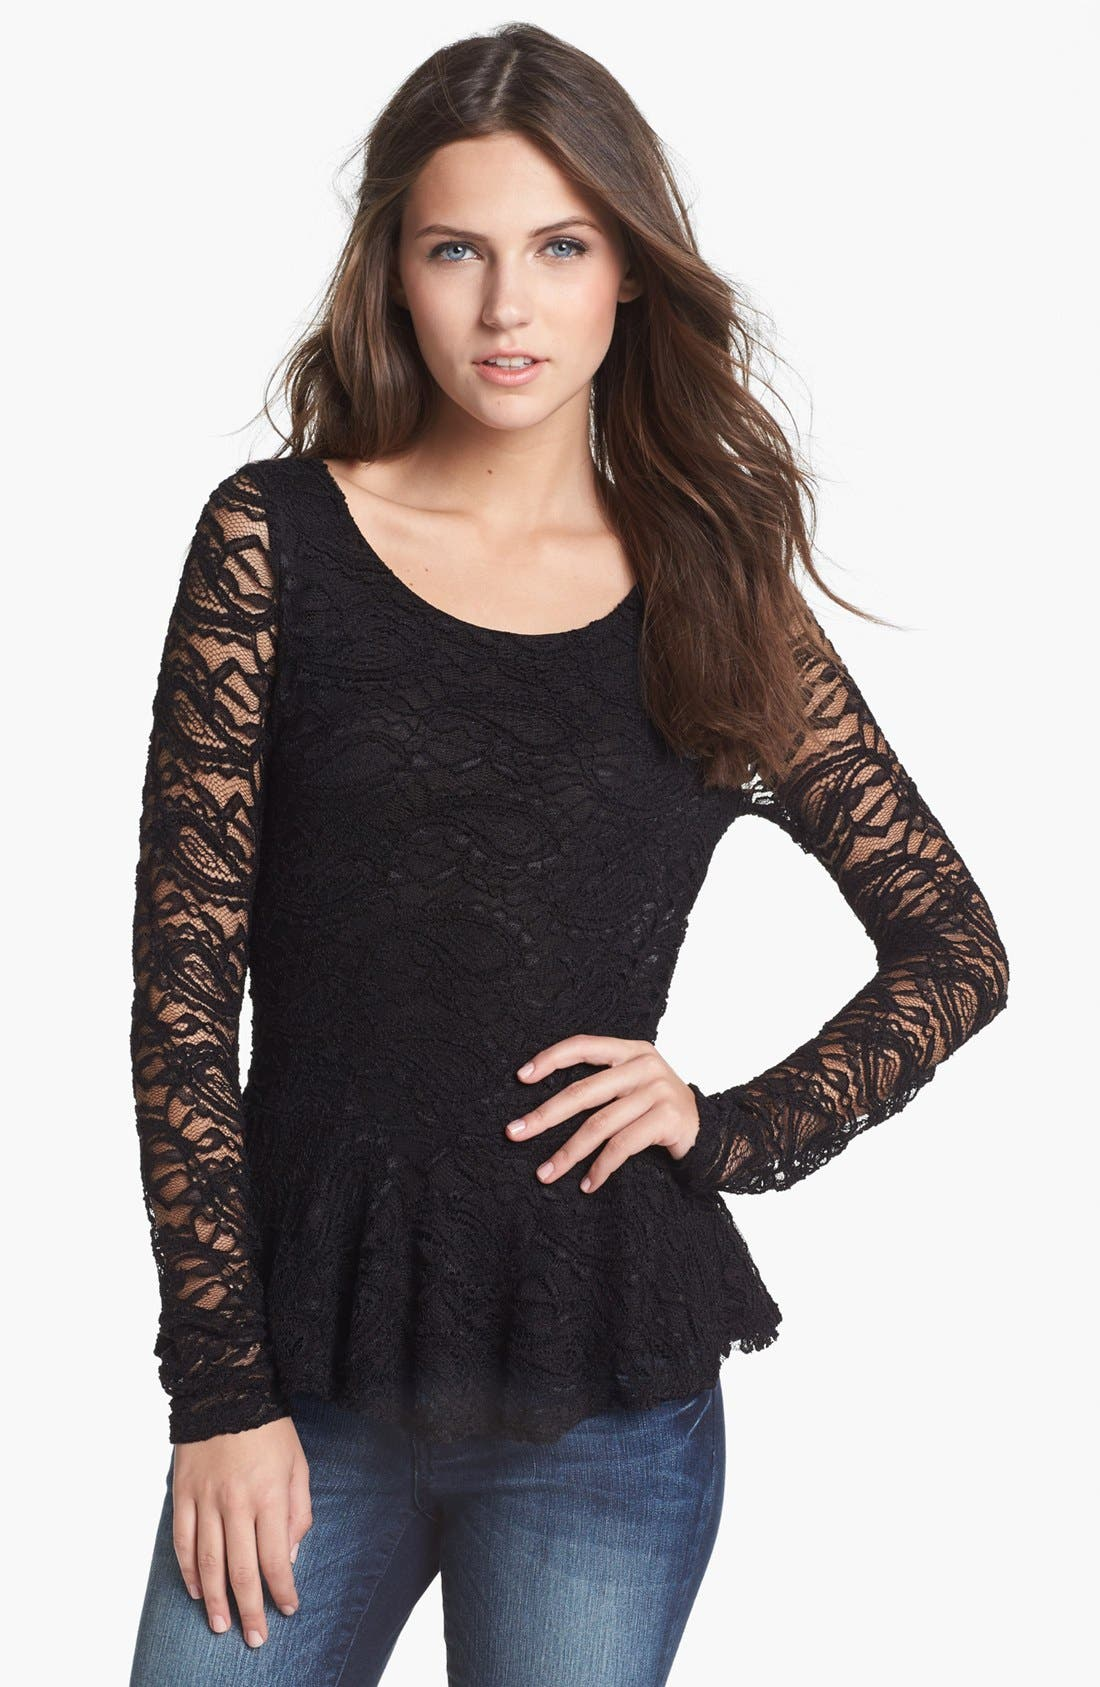 Alternate Image 1 Selected - Haute Society Long Sleeve Lace Peplum Top (Juniors)